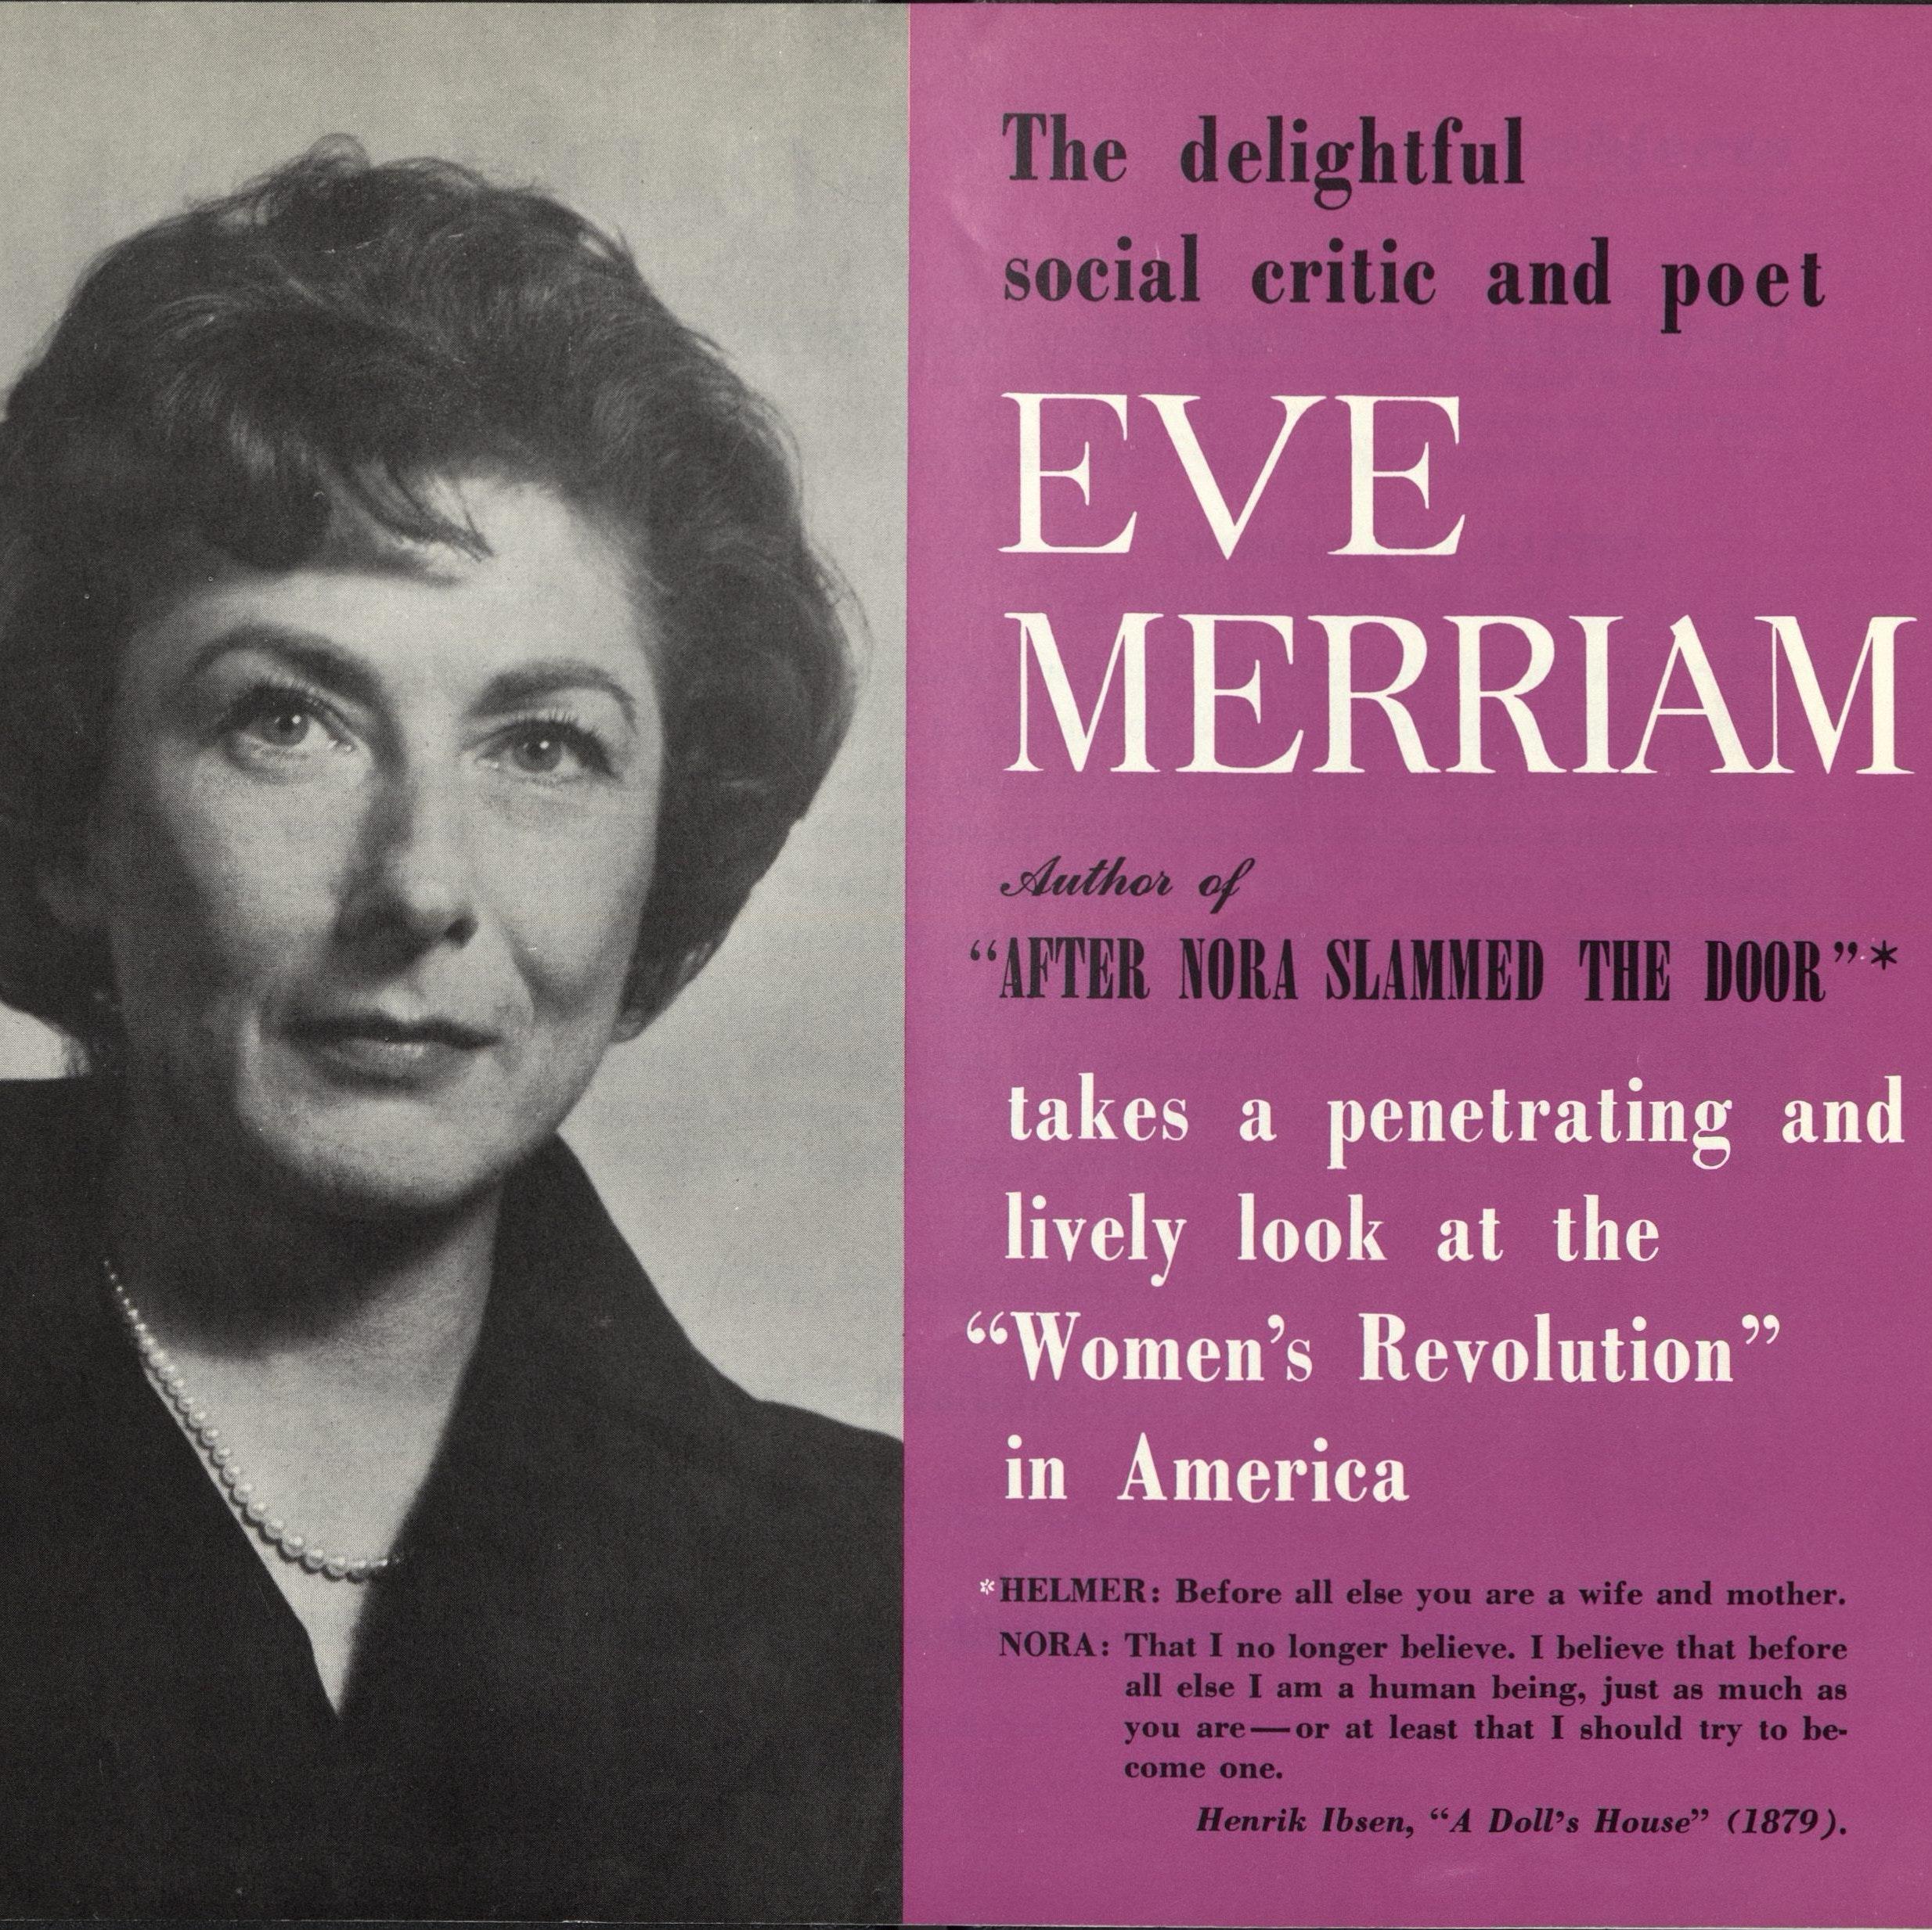 Brochure with Eve Merriam